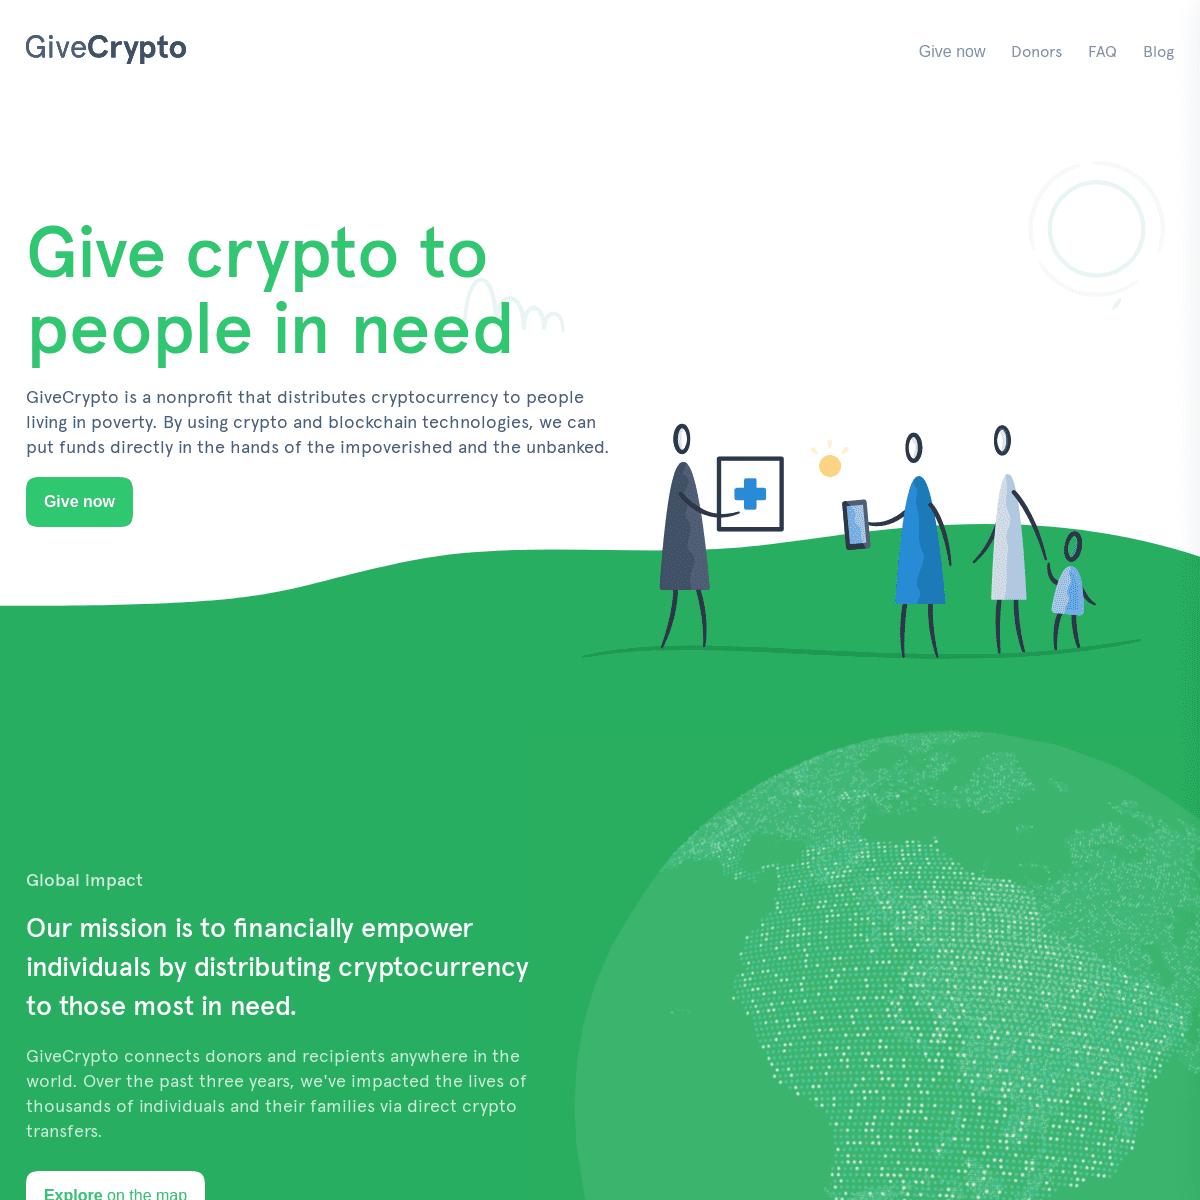 Home - GiveCrypto.org